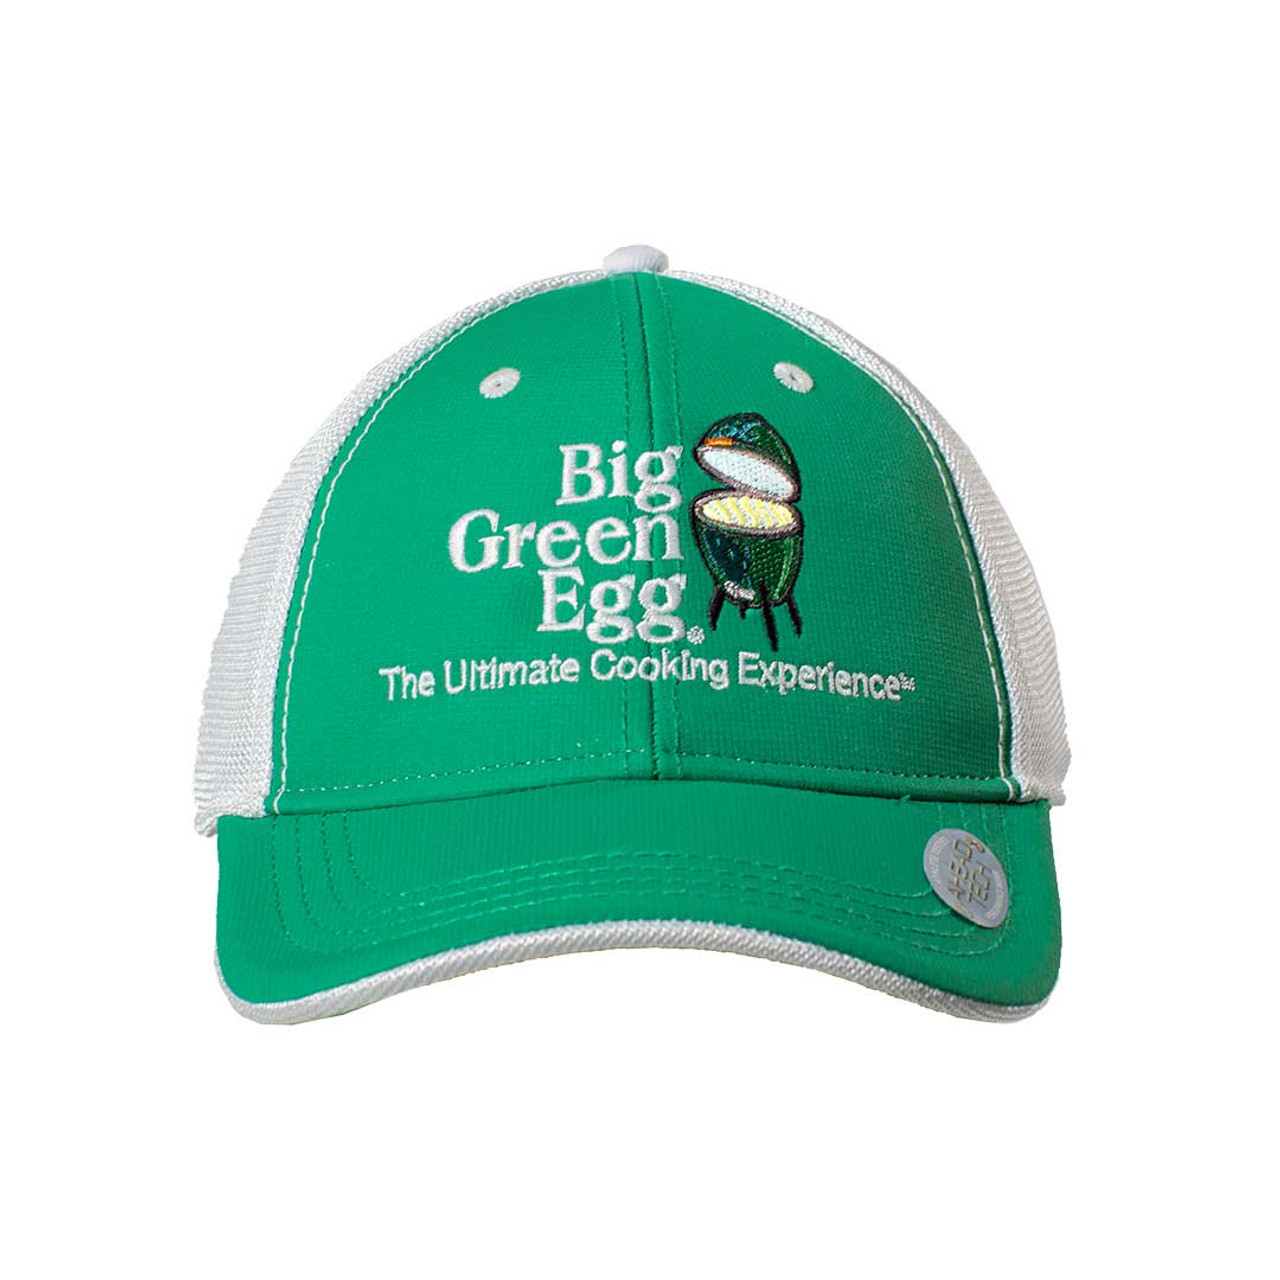 Big Green Egg UPF 50+ Logo Cap – Green/White - Front View